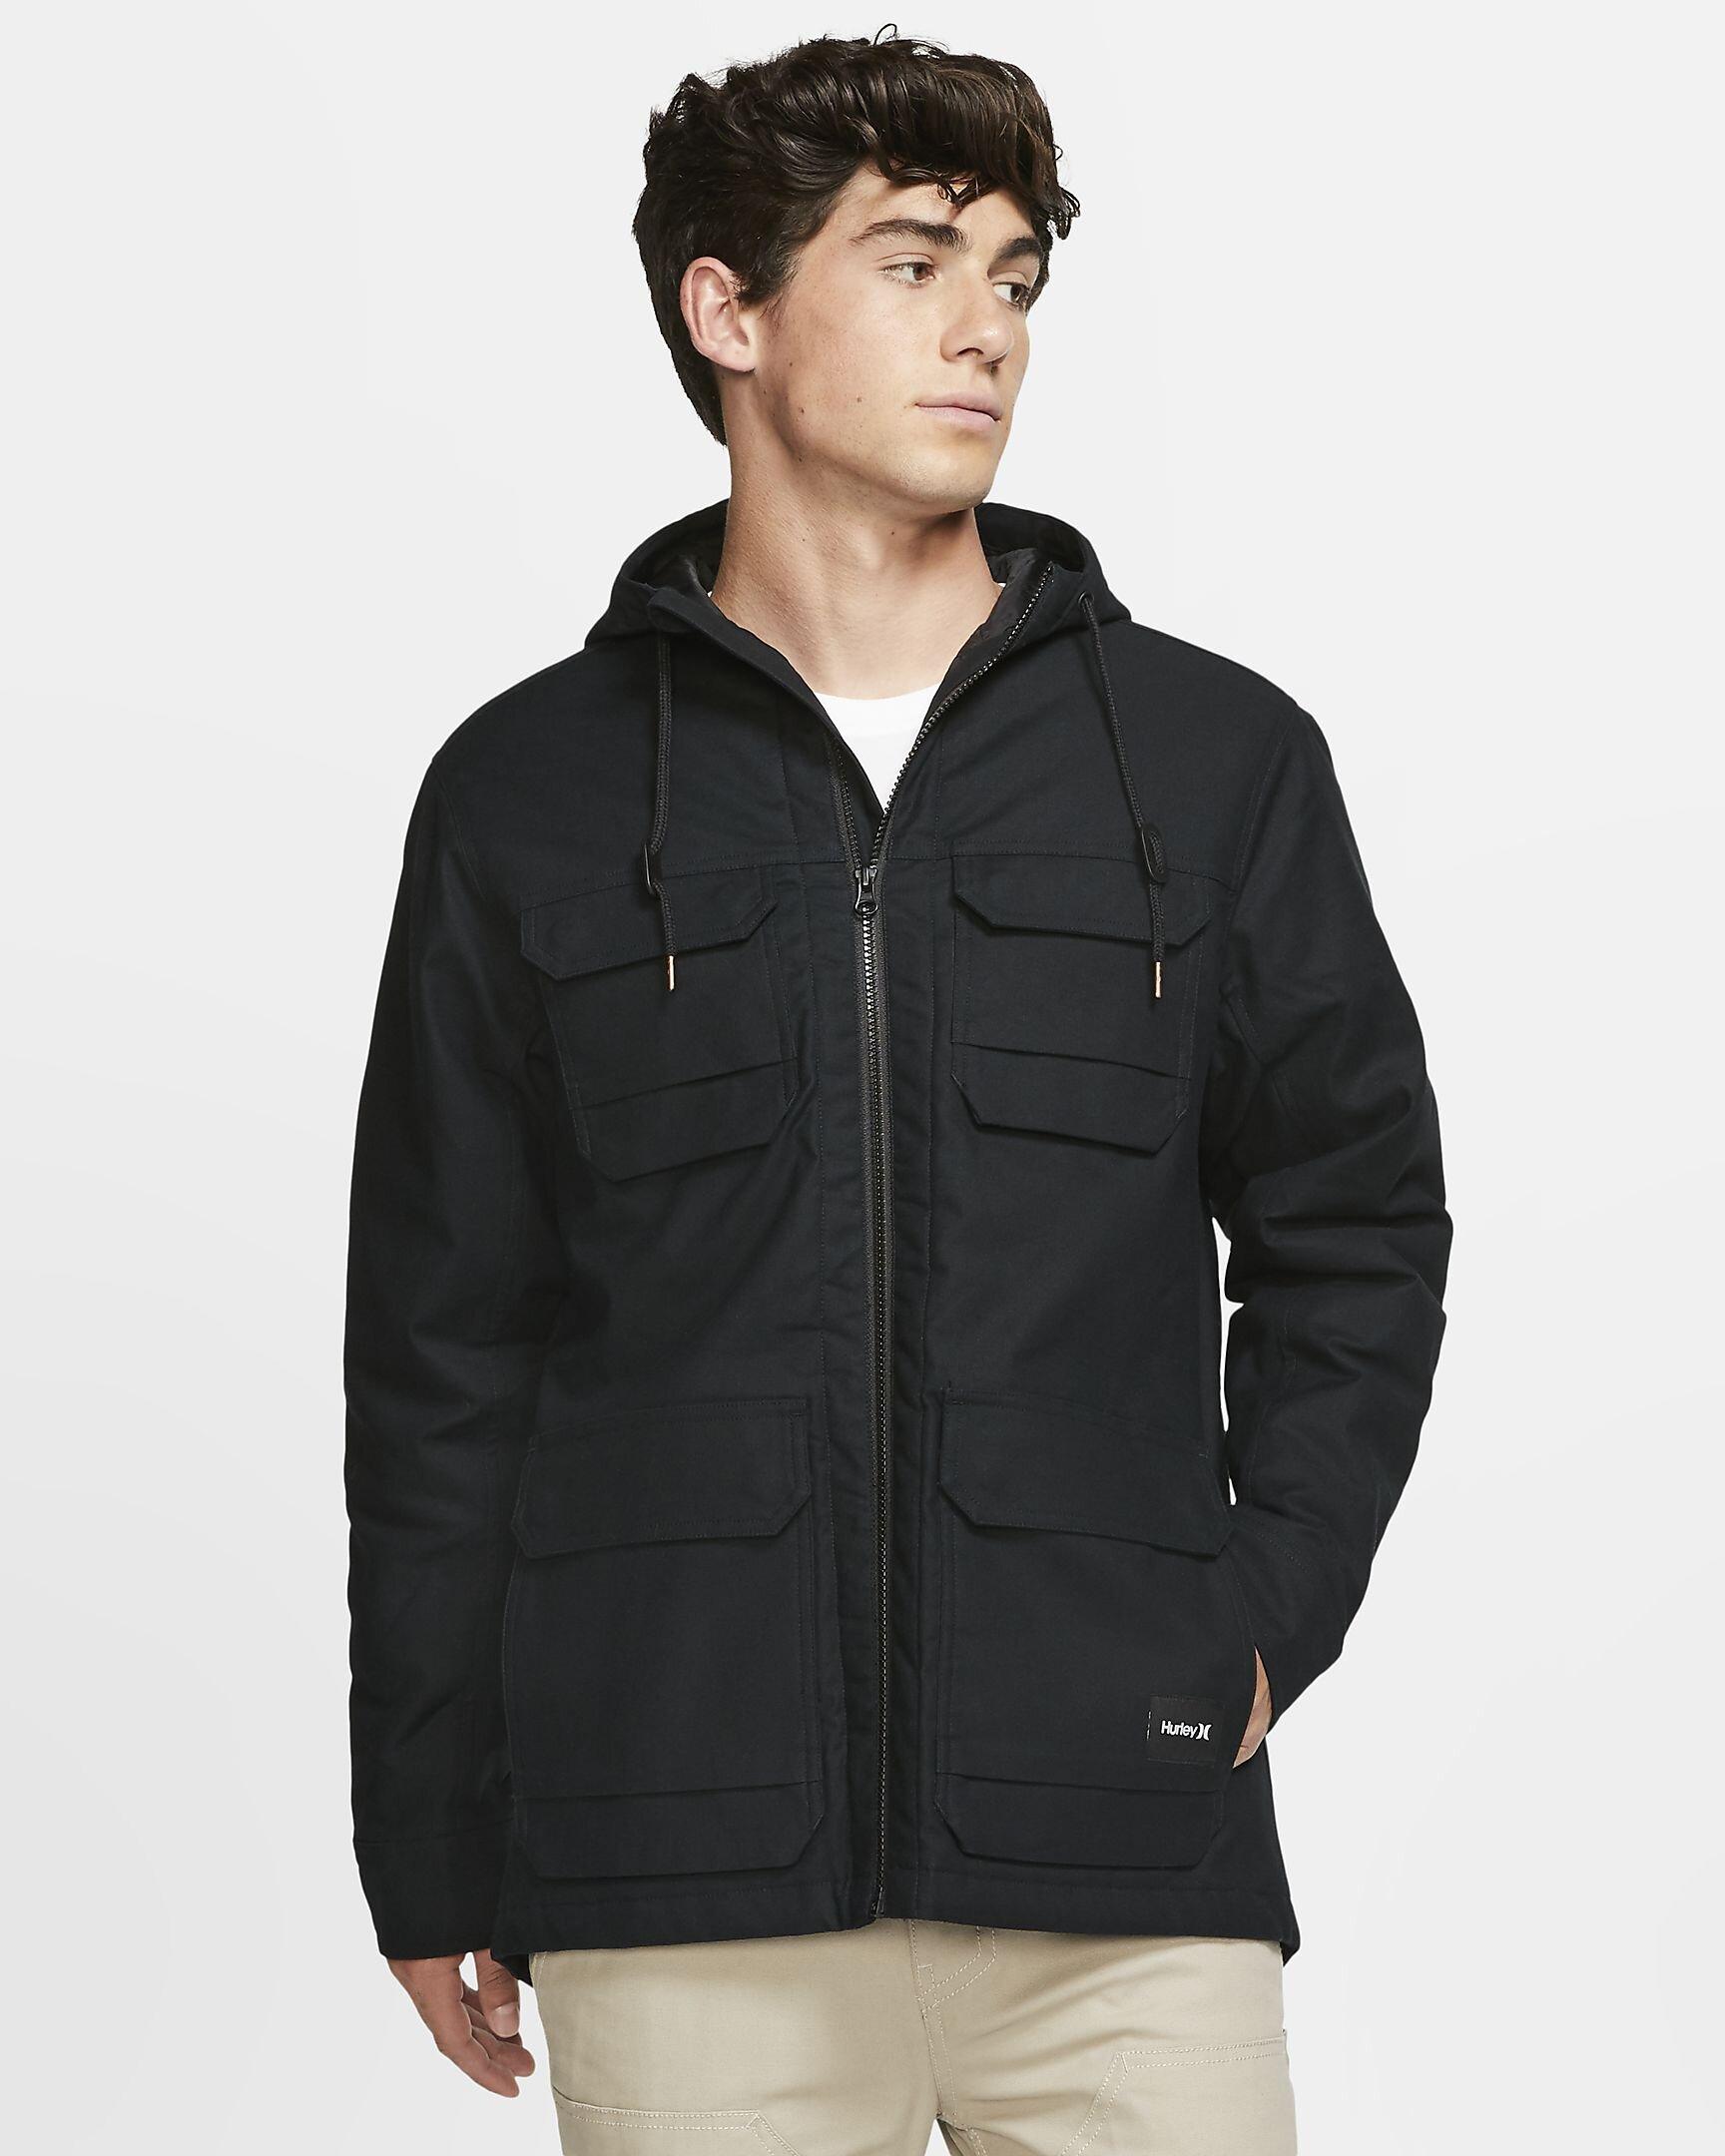 hurley-m65-mens-jacket-3229Xq-3.jpg